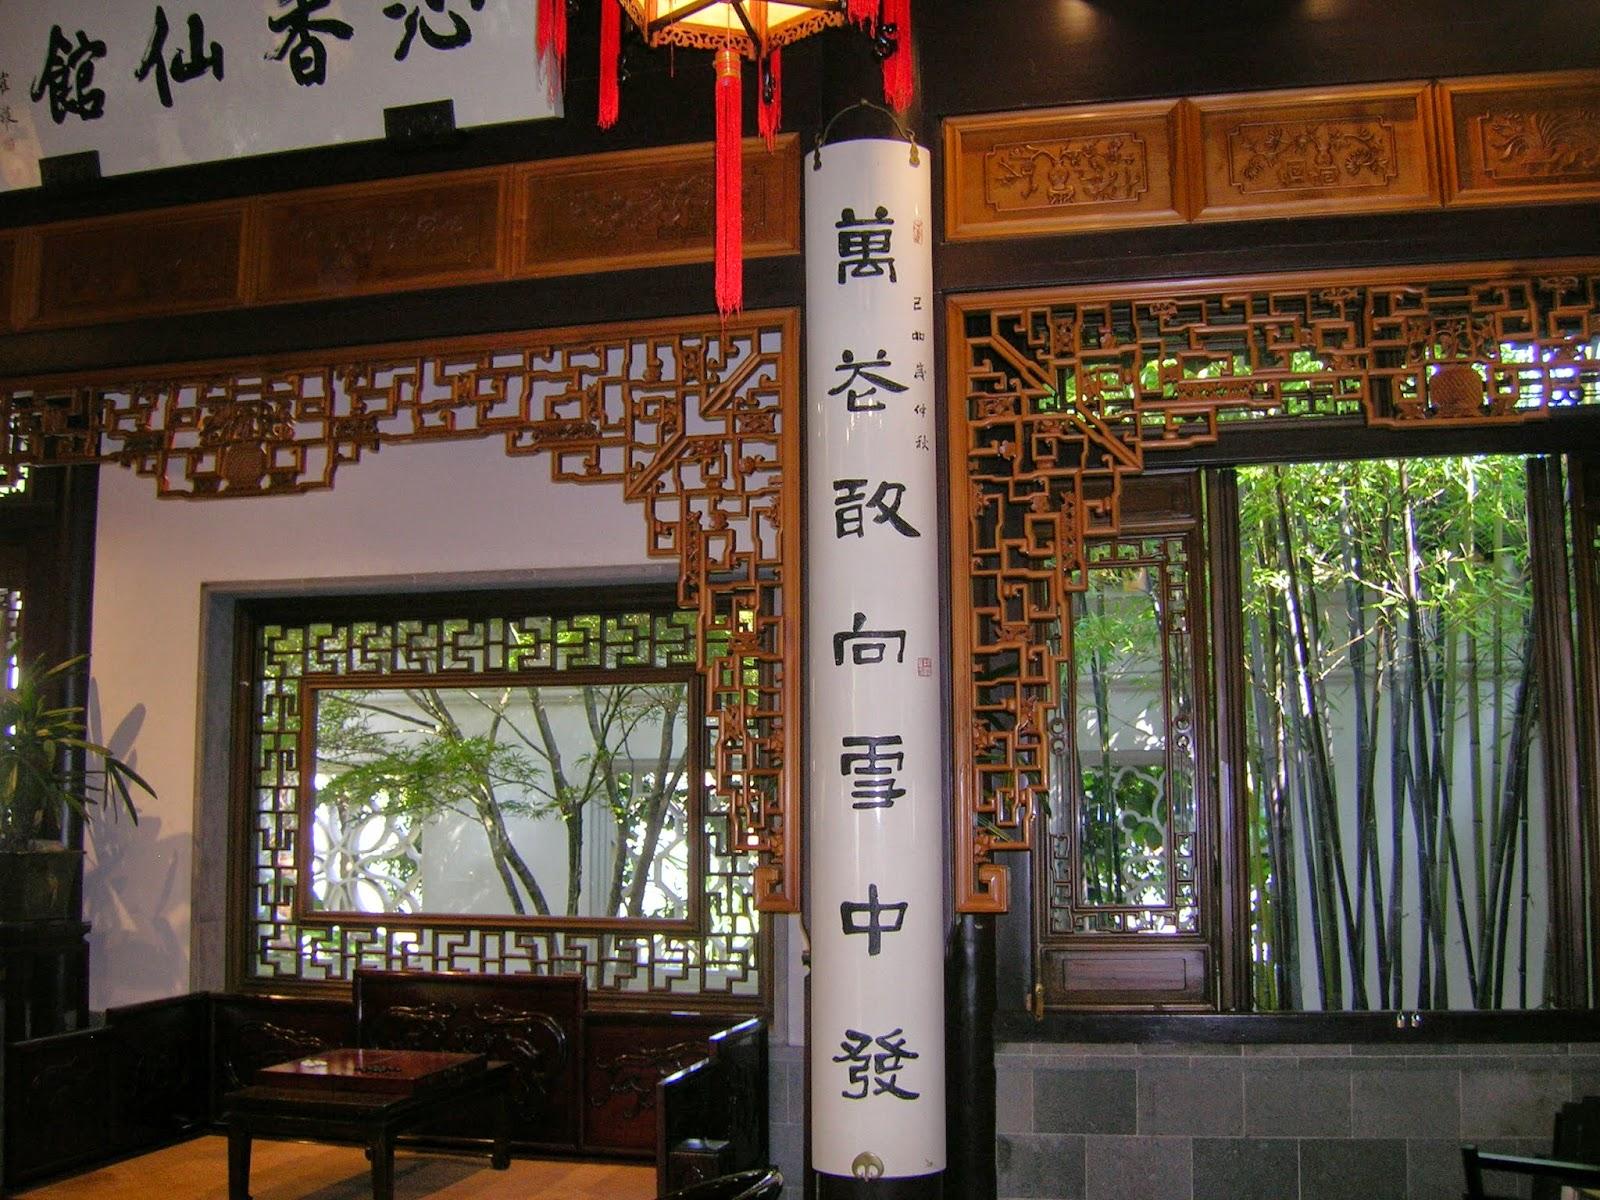 Lan Su Chinese Garden – Unleashed in Oregon